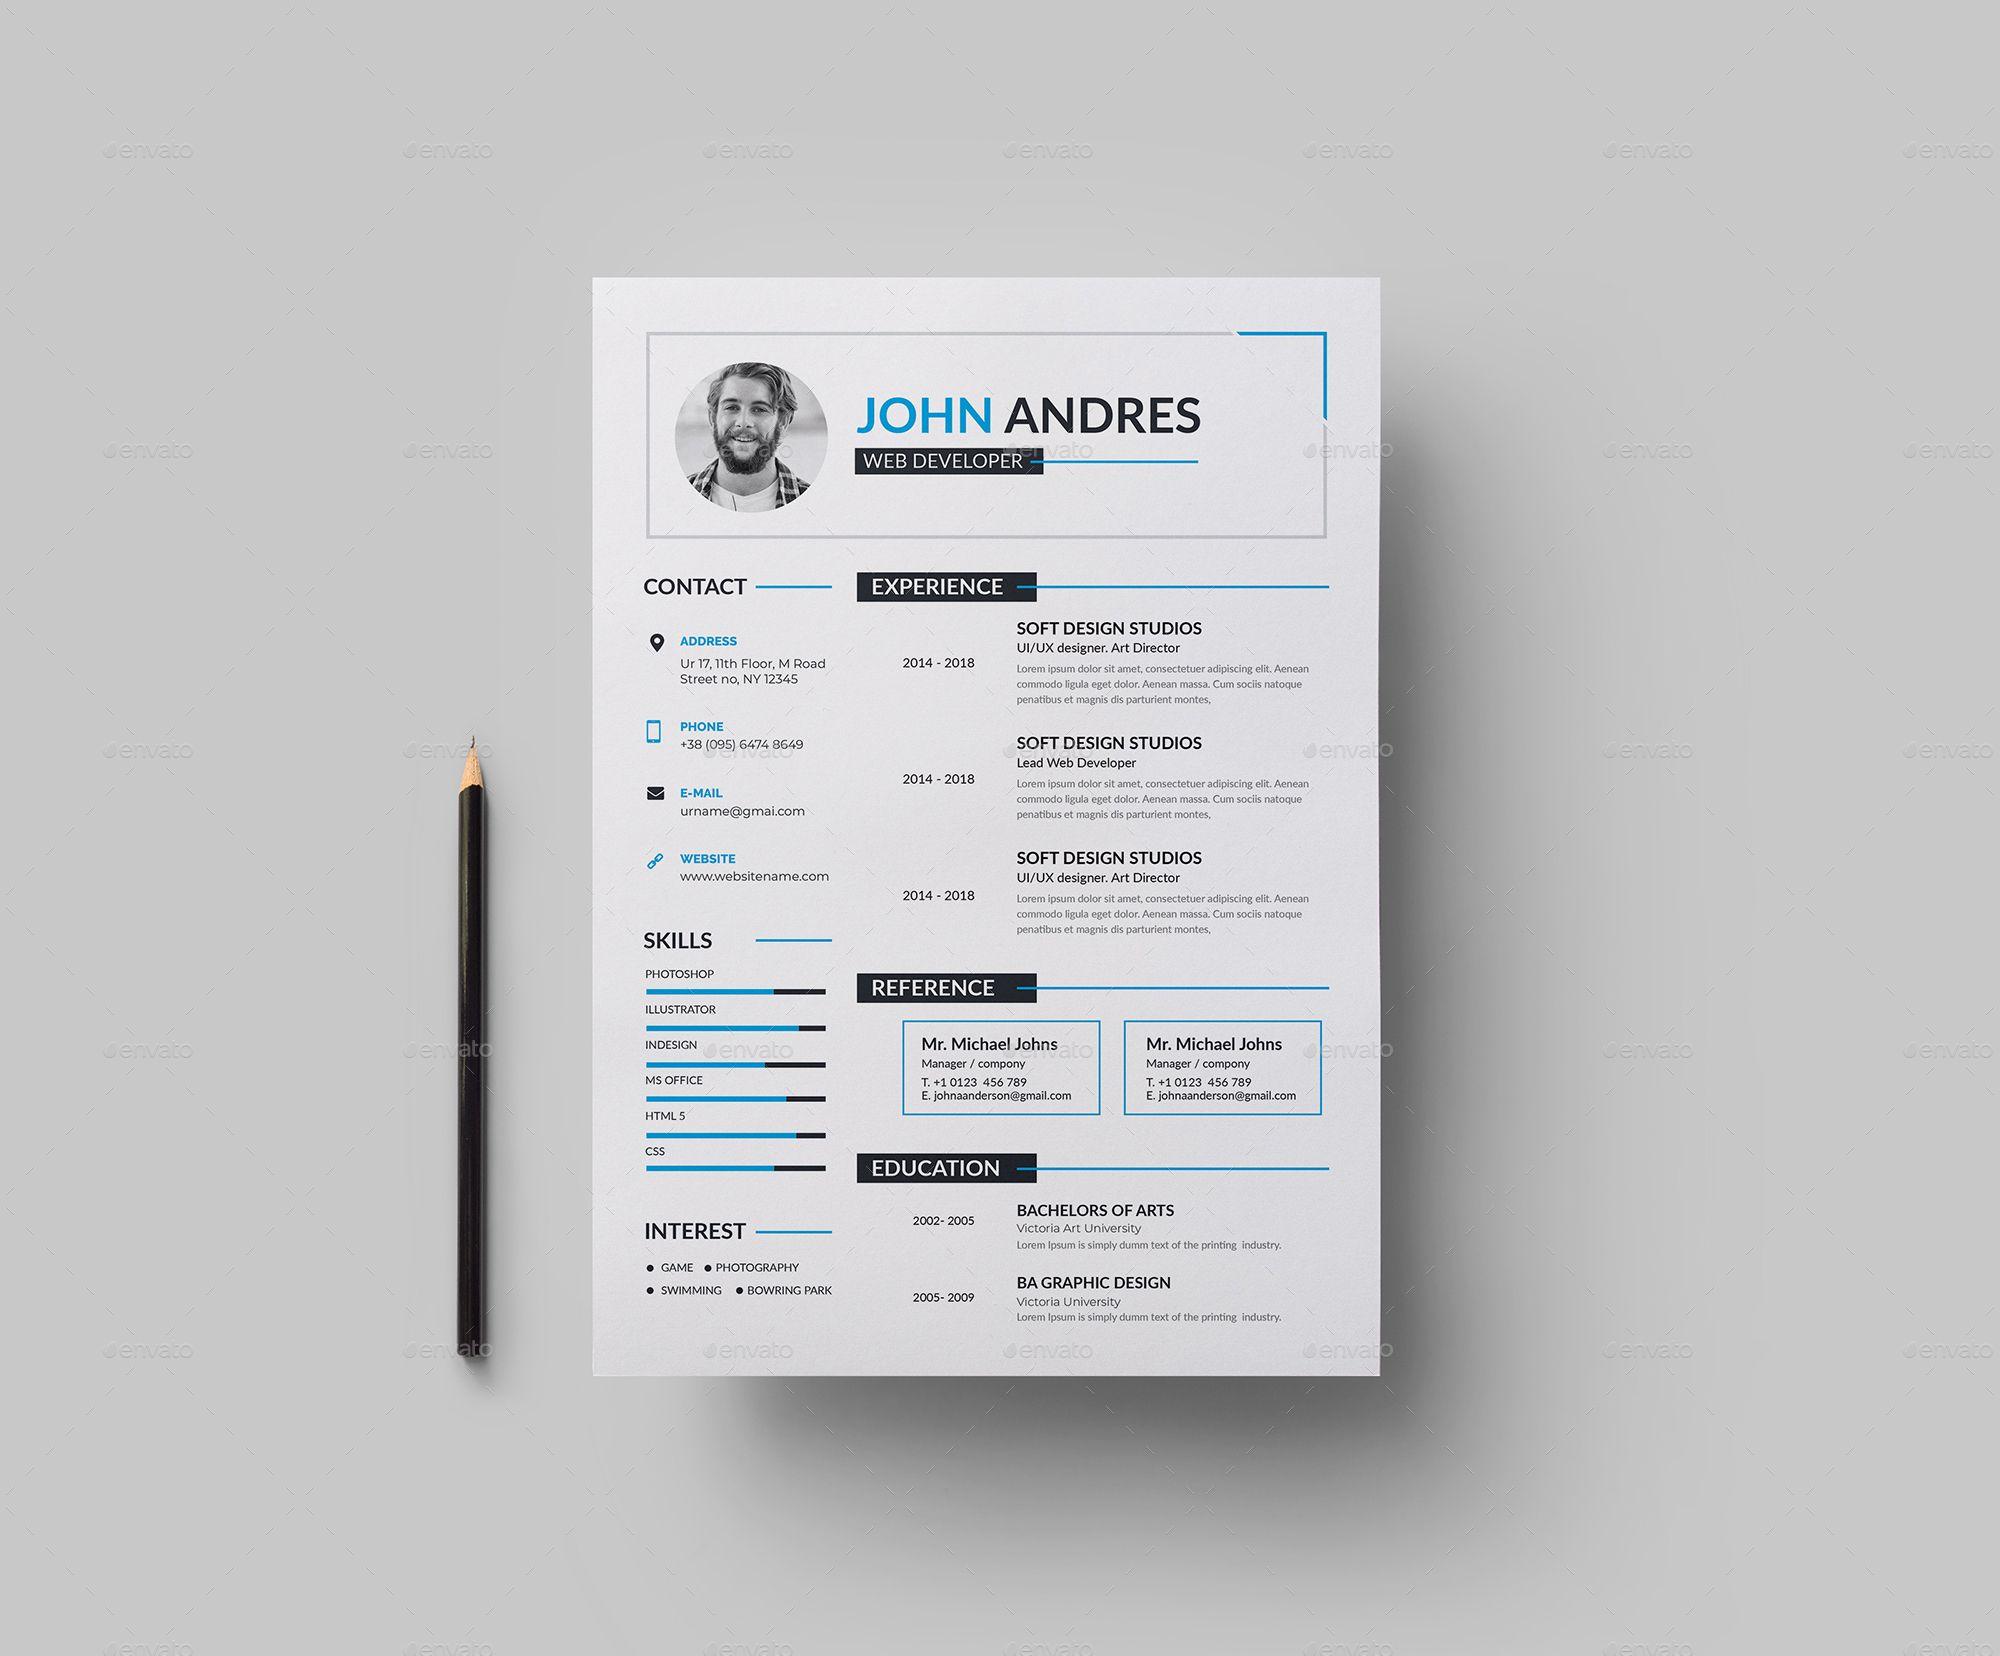 Resume Resume, Resume template, Resume templates